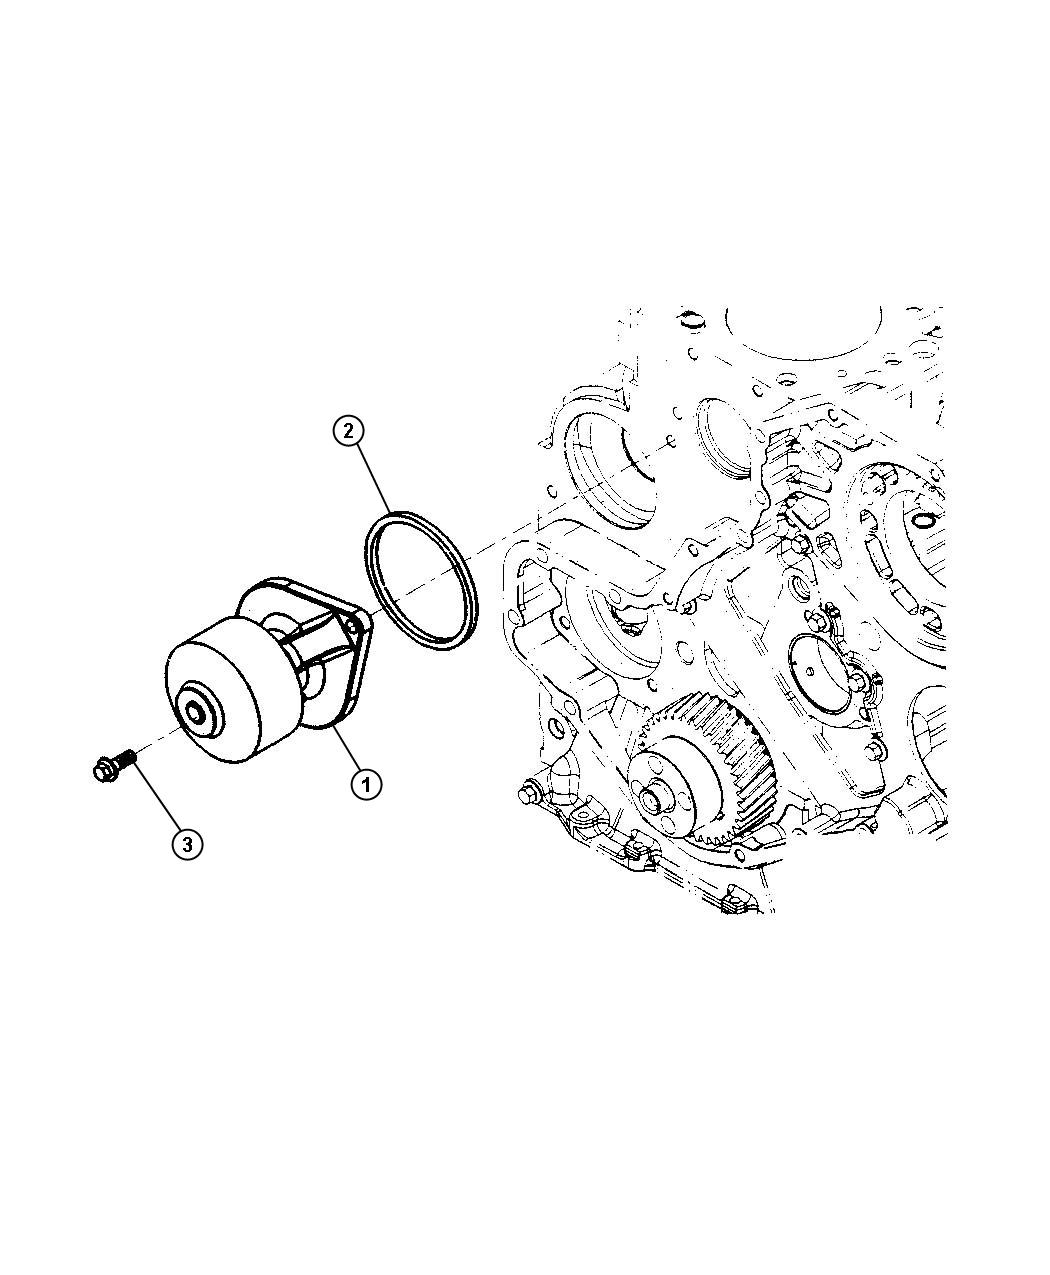 Dodge Ram Pump Water Emissions Statesel